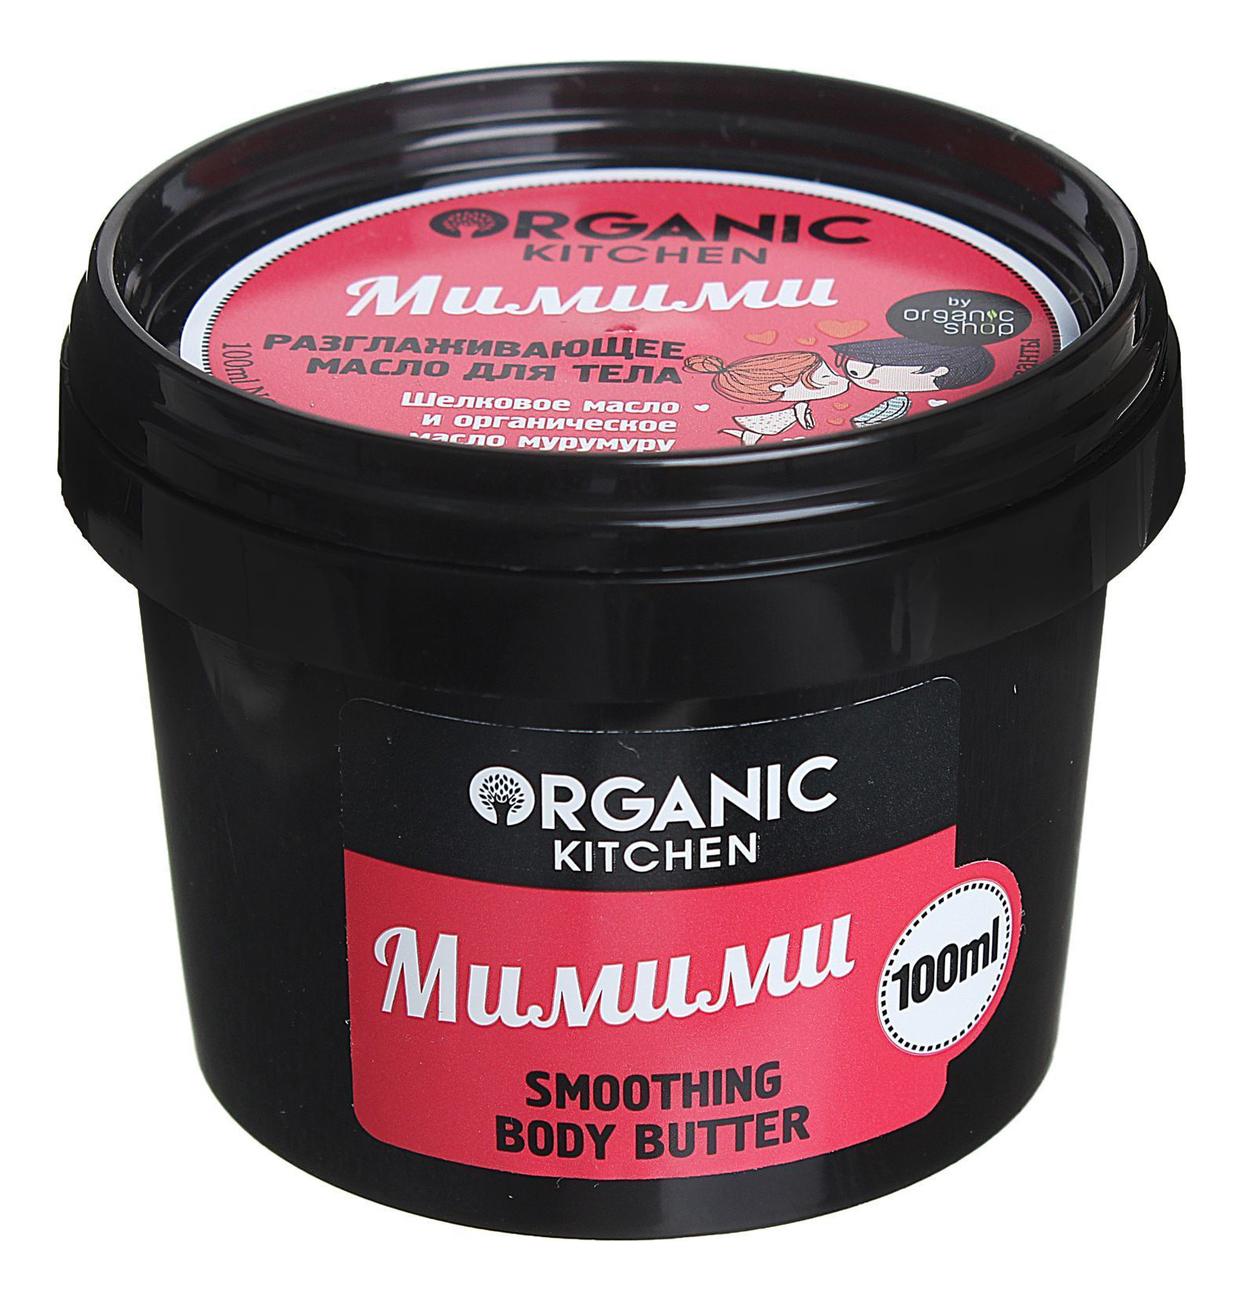 Разглаживающее масло для тела Мимими Organic Kitchen Smoothing Body Butter 100мл